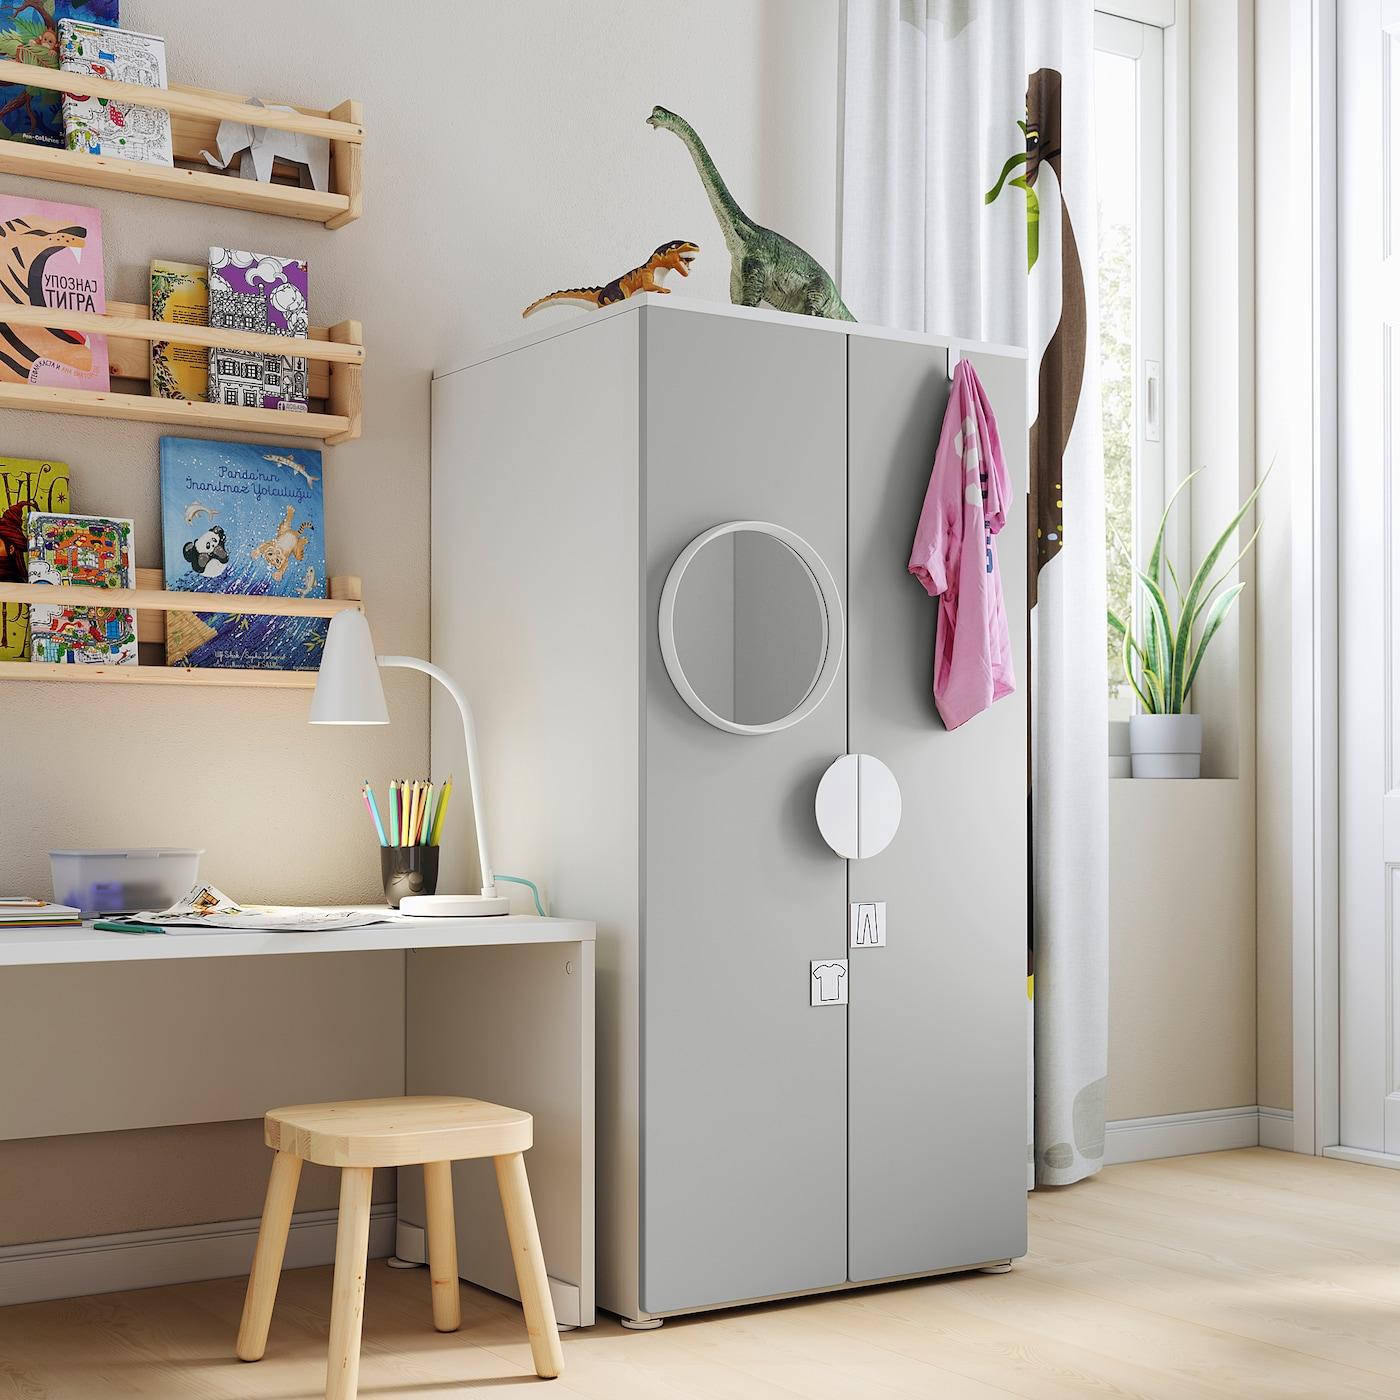 SMÅSTAD / PLATSA Wardrobe, white/grey, 60x57x123 cm